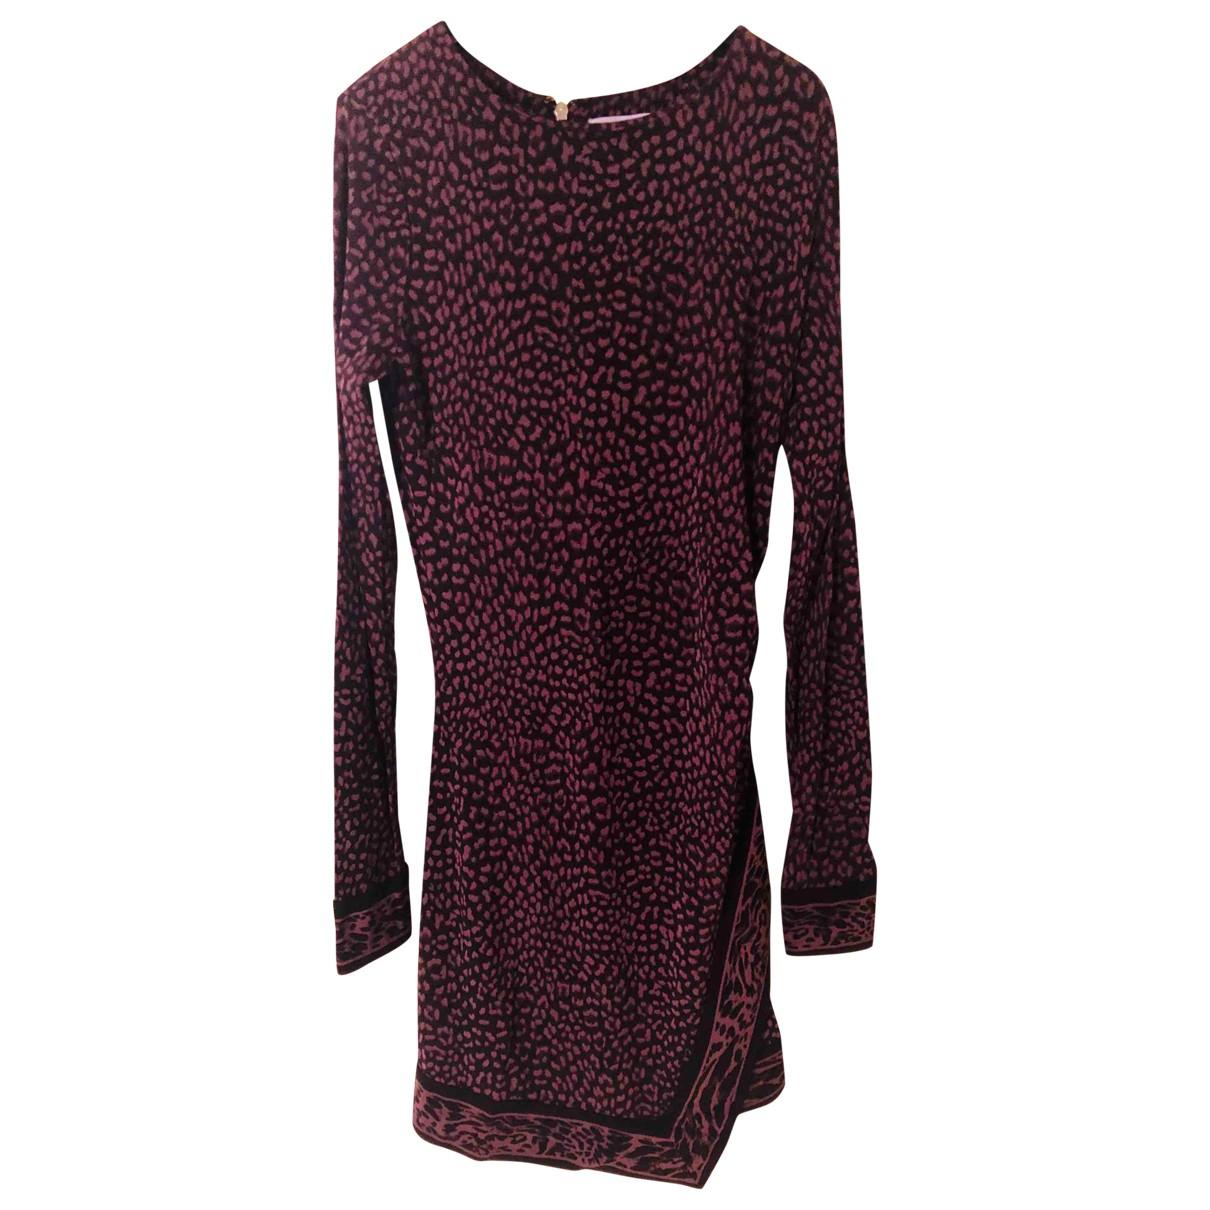 Michael Kors \N Brown dress for Women XS International